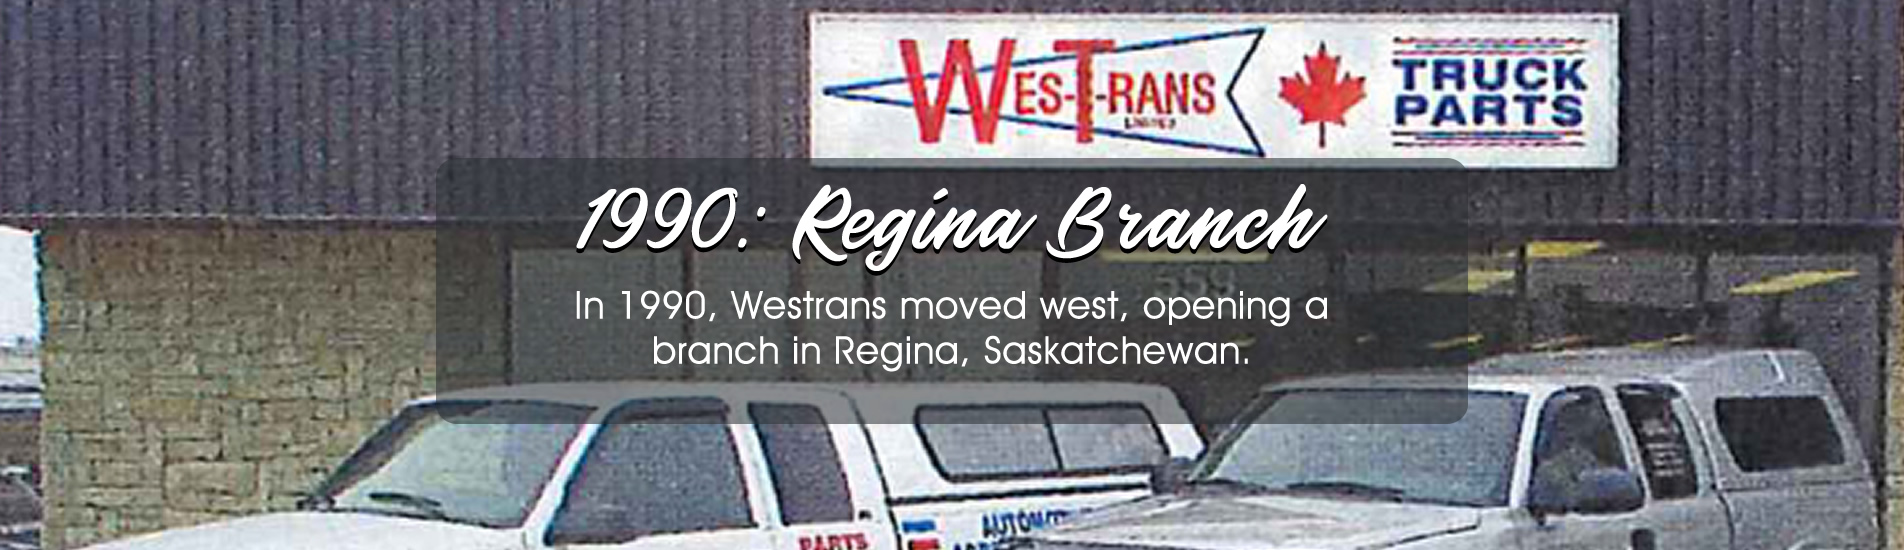 westrans-Regina-Branch-1990